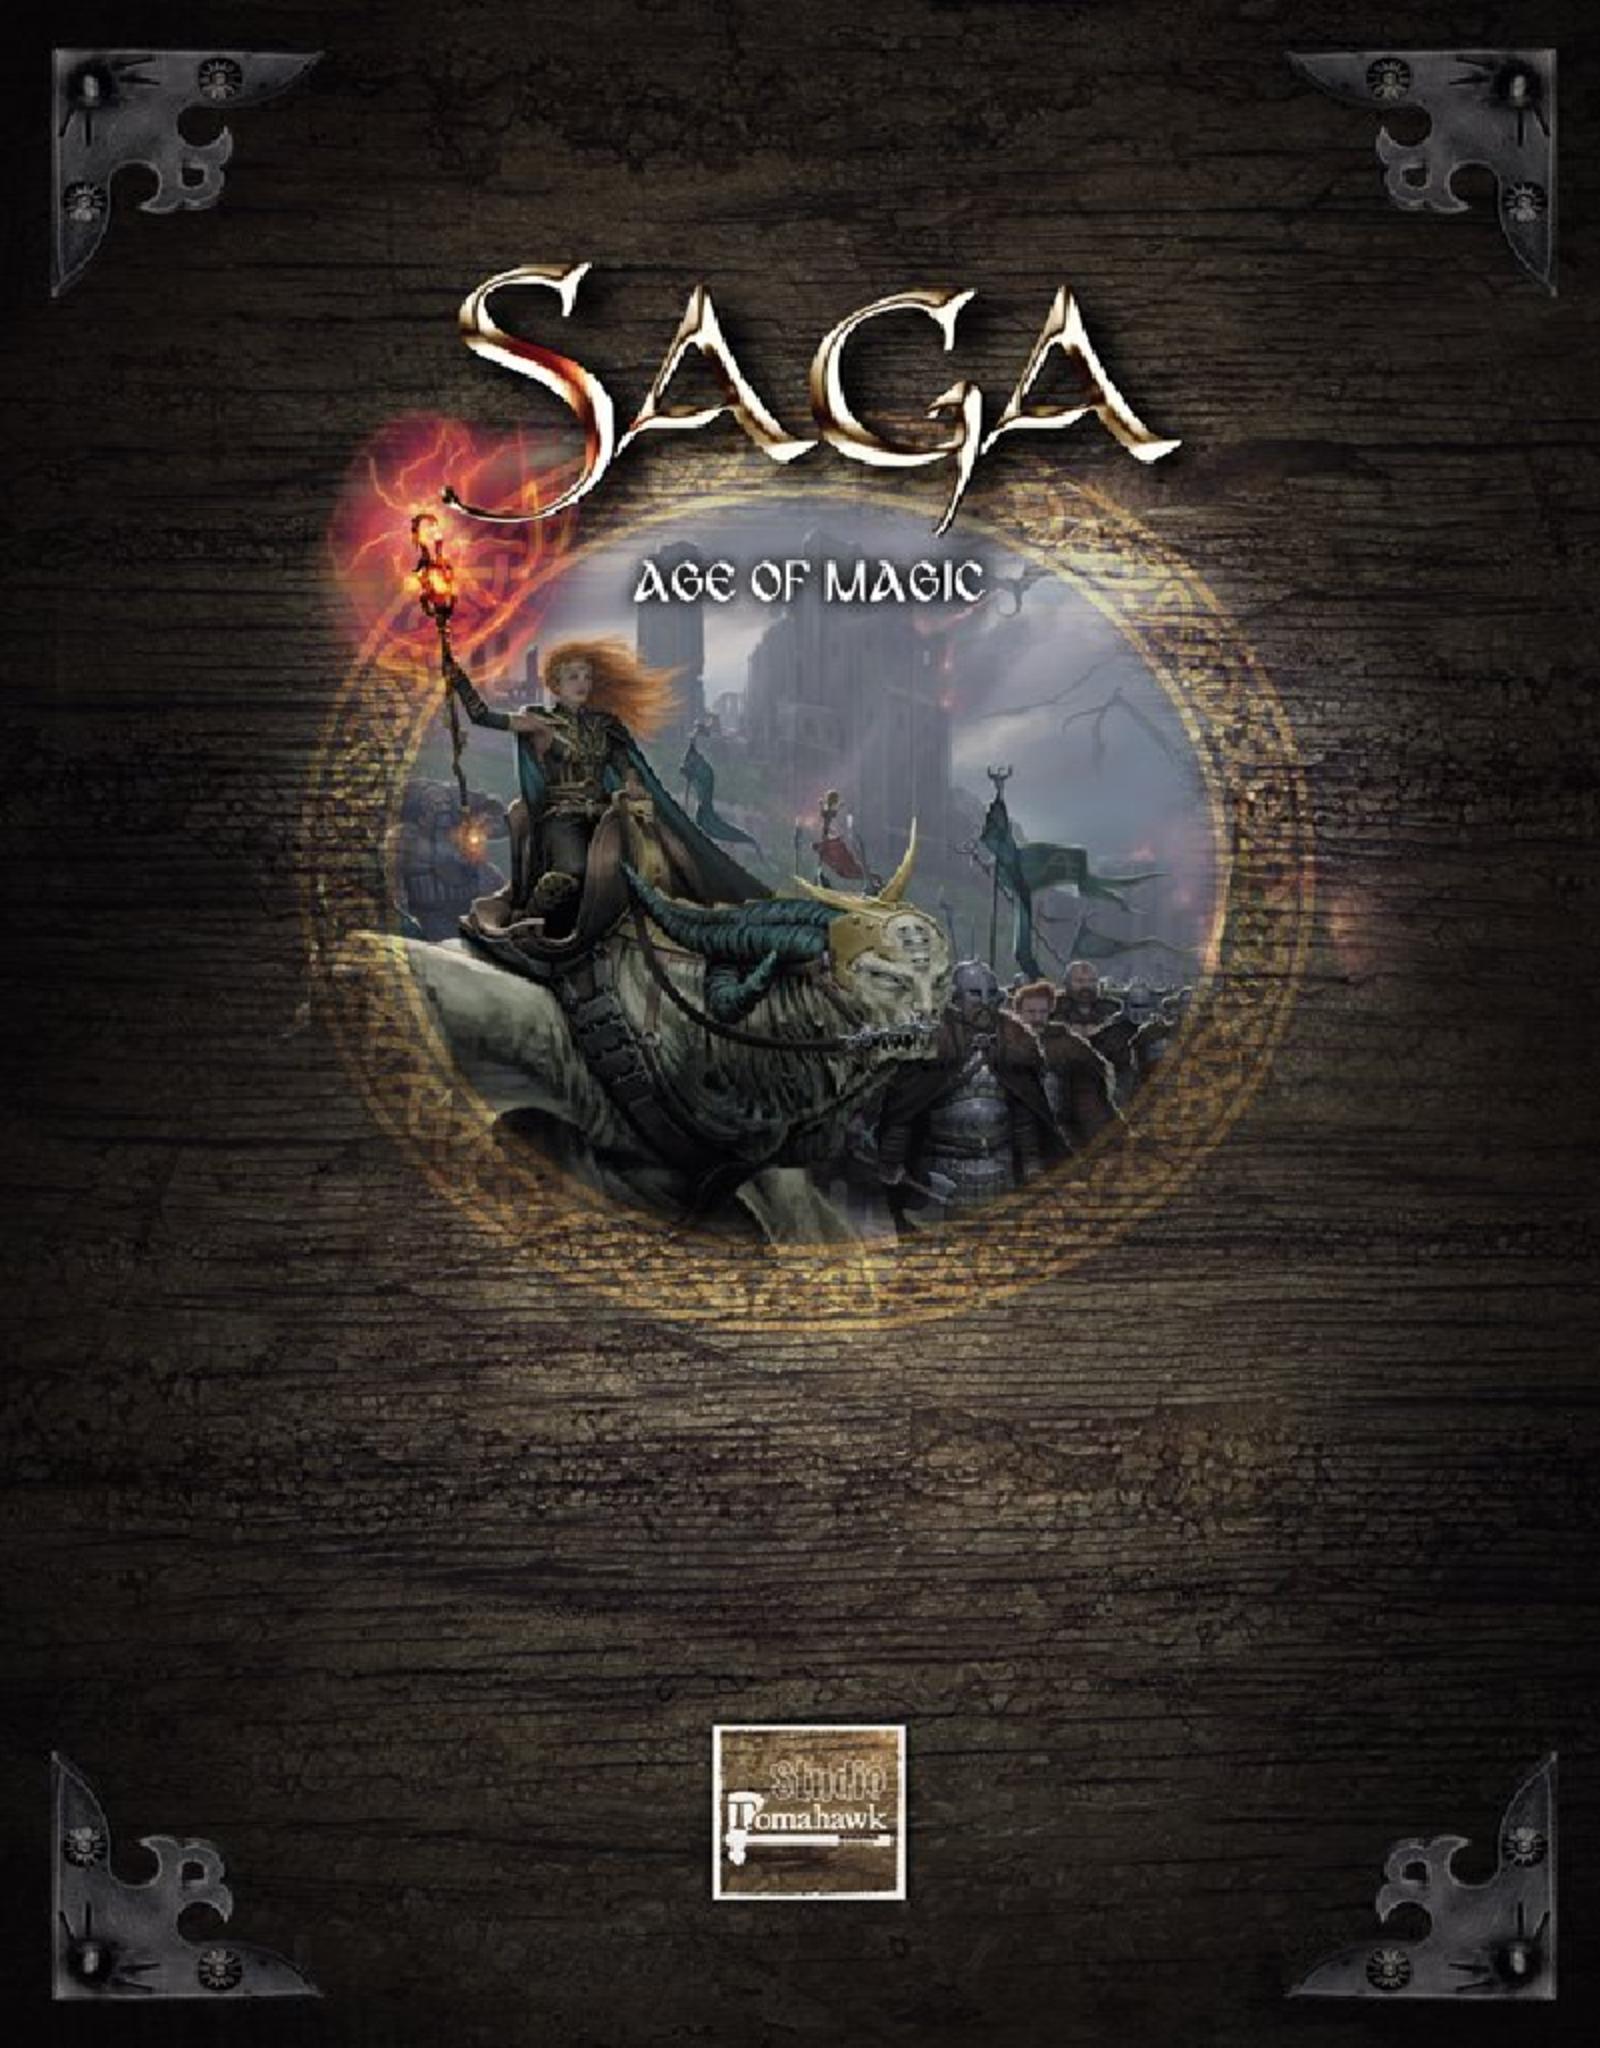 Studio Tomahawk Saga - Age of Magic